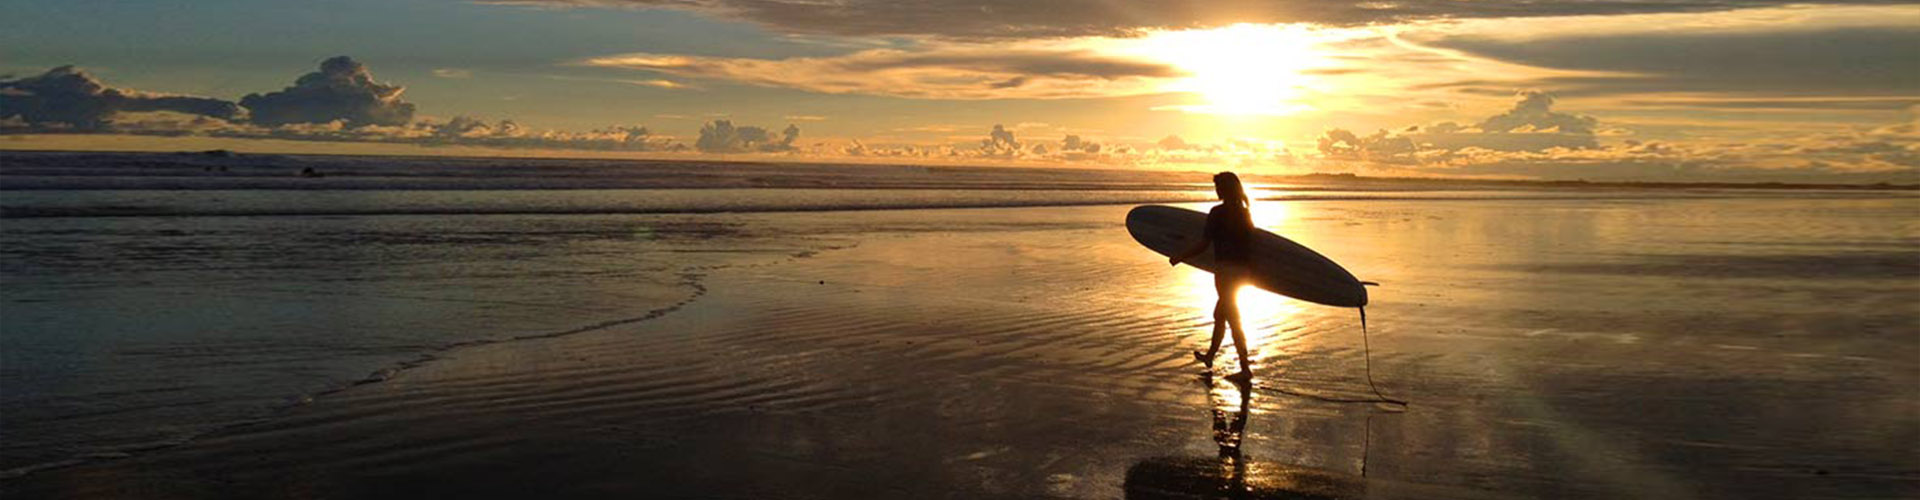 costa rica surf pics 4